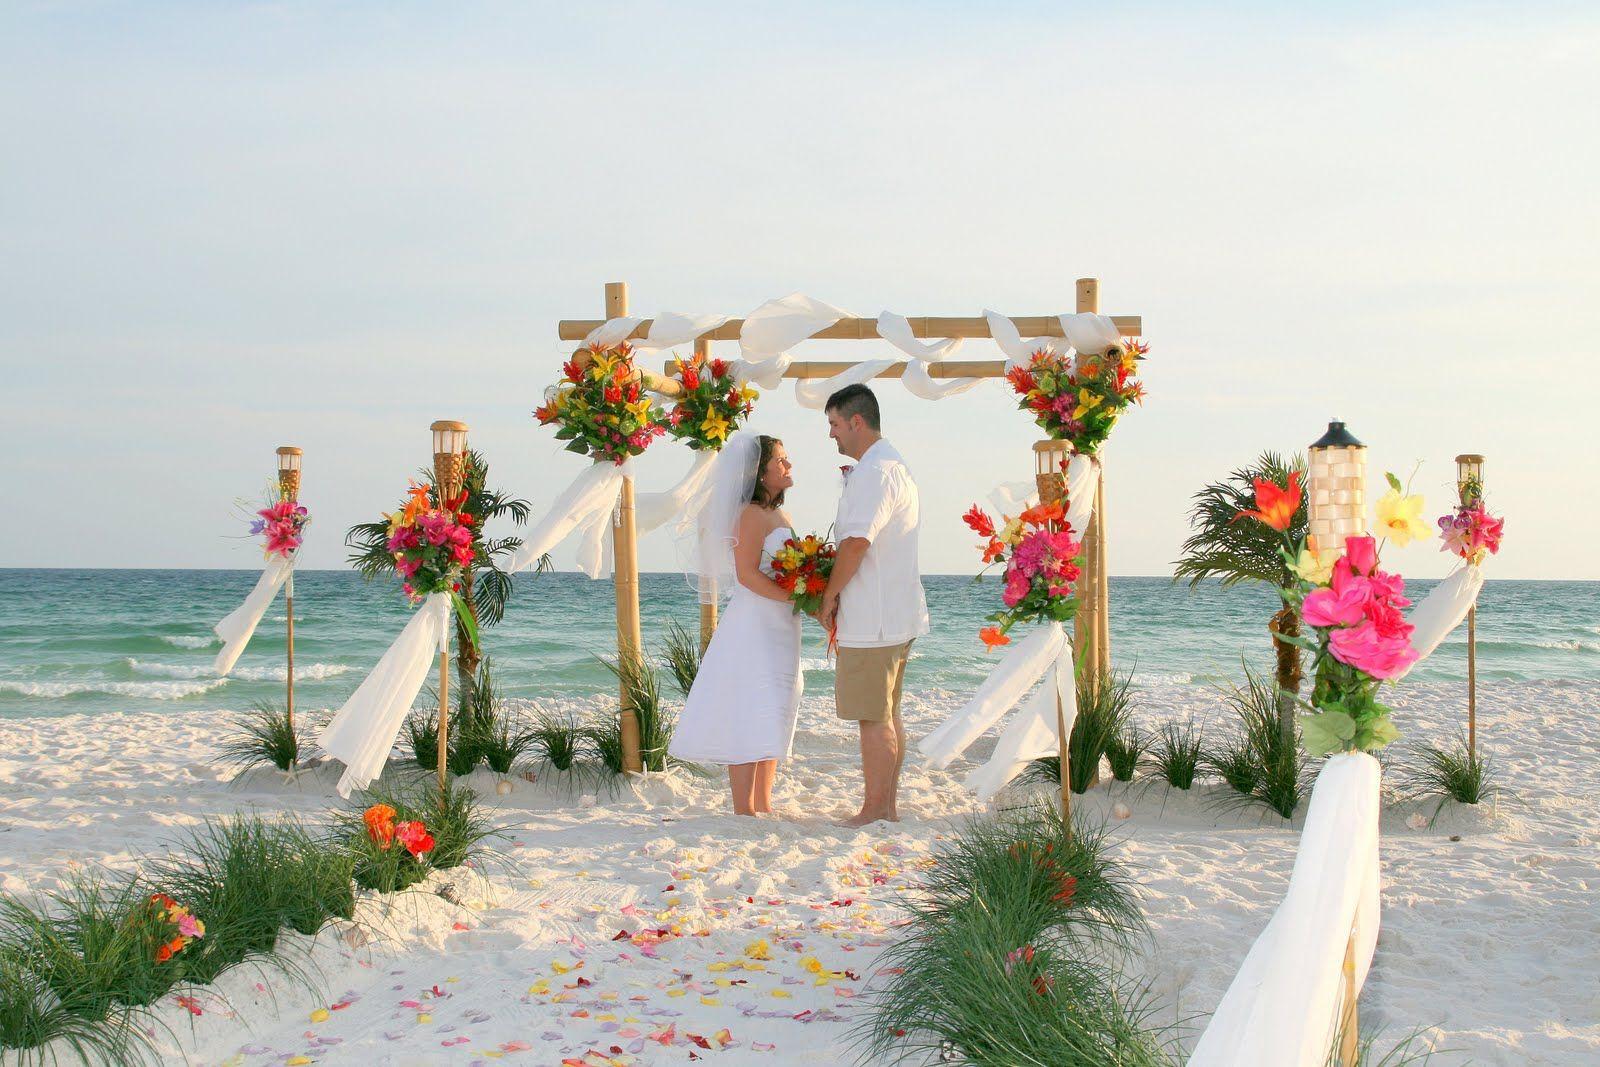 Destin Florida Weddings Packages Beach Beach destination